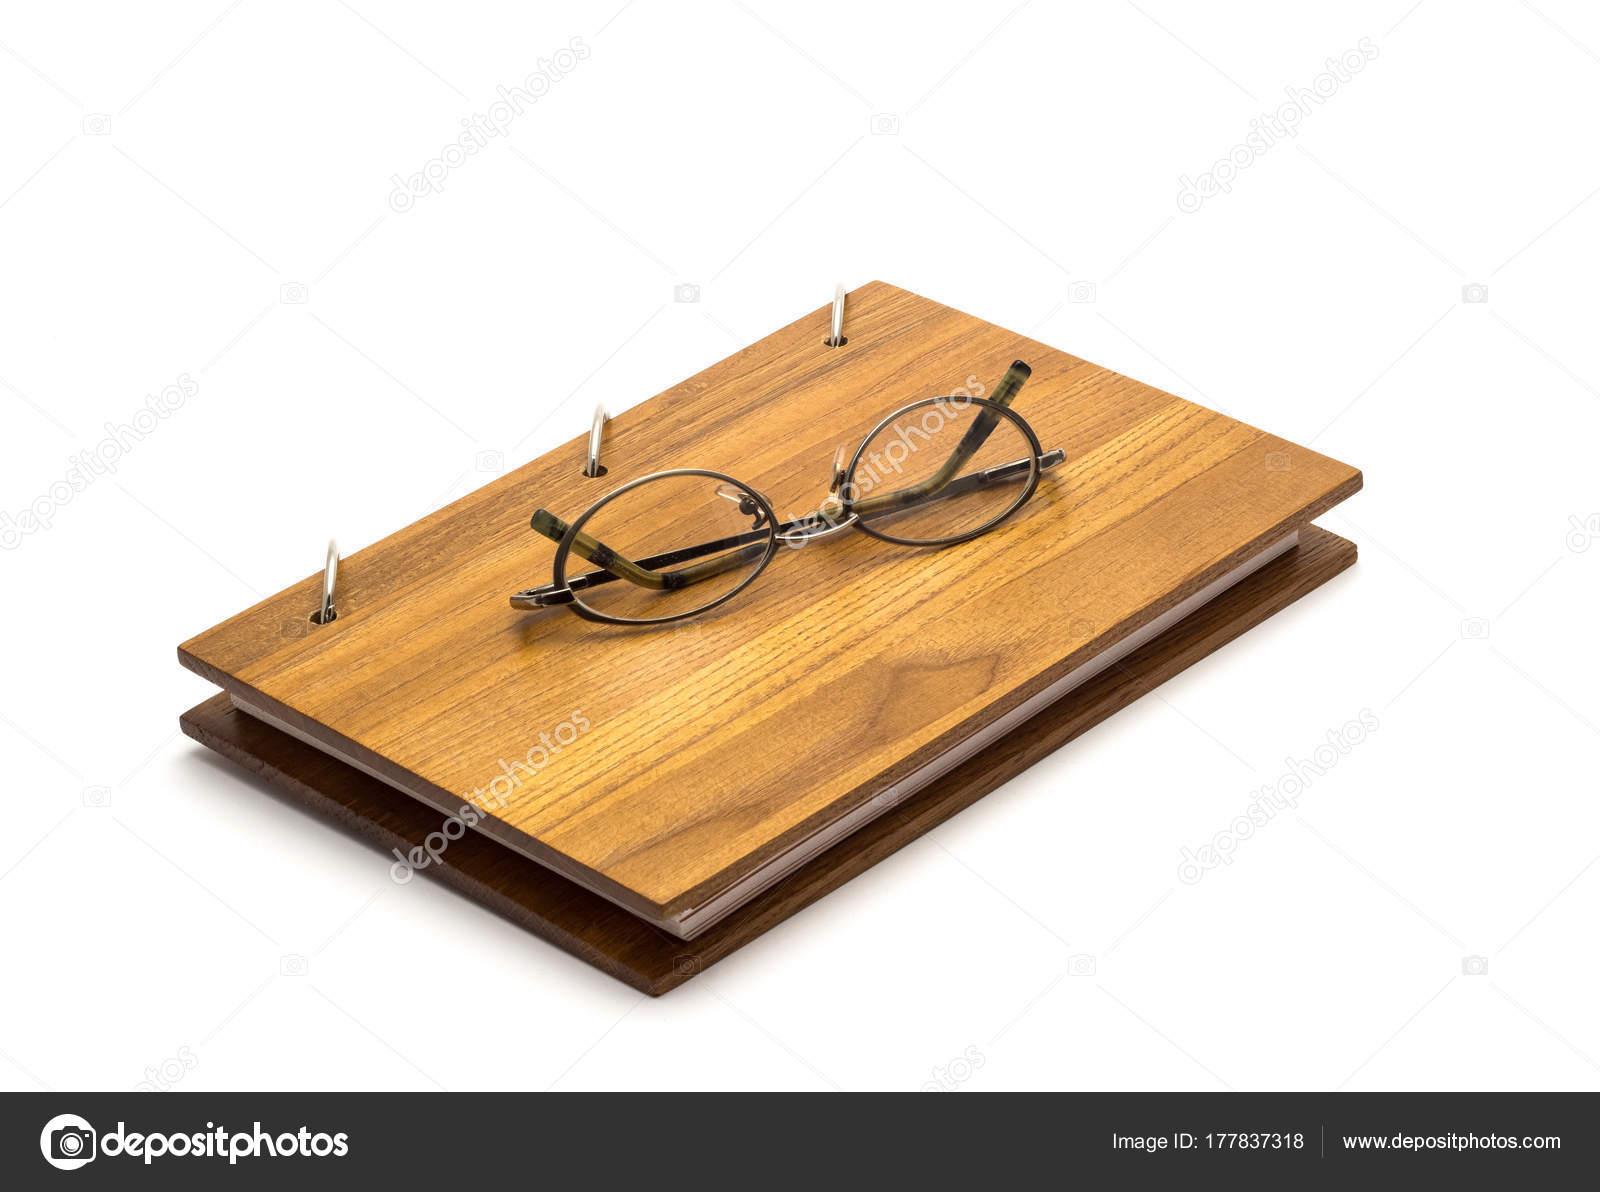 a7d2fbf9bb Γυαλιά και το λεύκωμα σημειωματάριο με κάλυμμα κατασκευασμένο από φυσικό  υλικό– εικόνα αρχείου